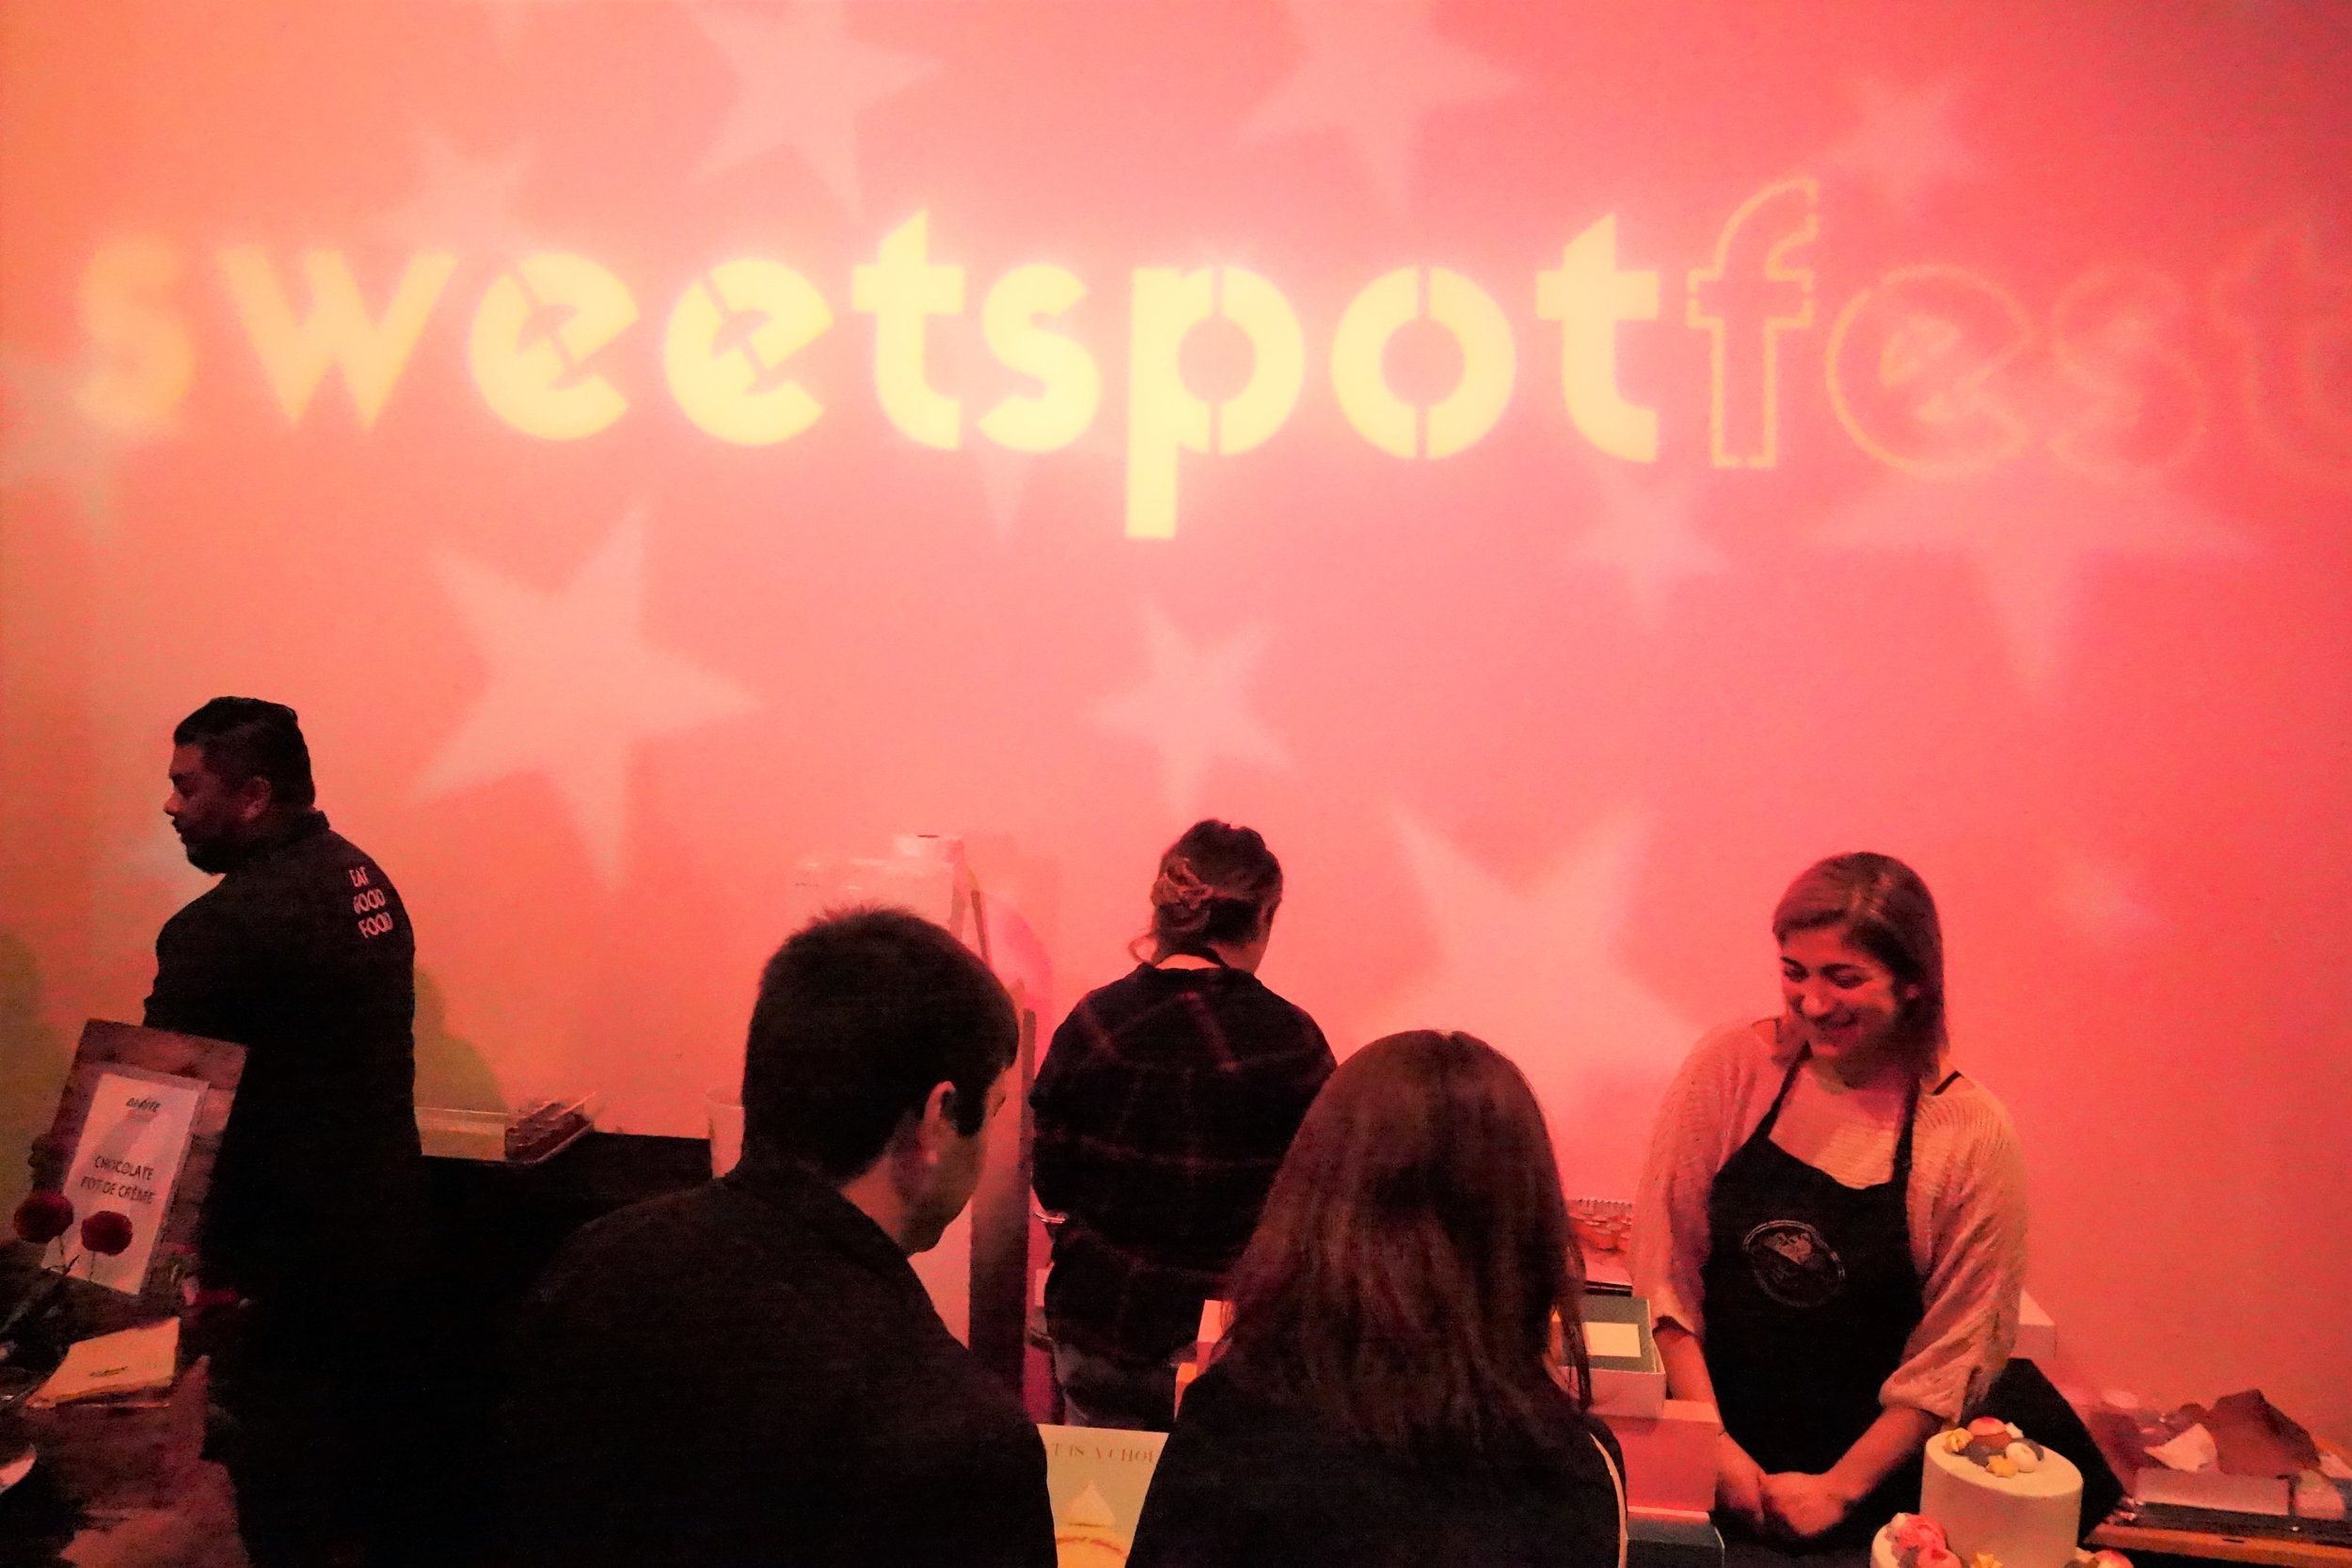 sweet-spot-fest-san-francisco-dessert-festival-2019-sf-food-photography-sandy-by-the-bay-sf-food-blog-sweet-spot-fest-sf-dessert-festival